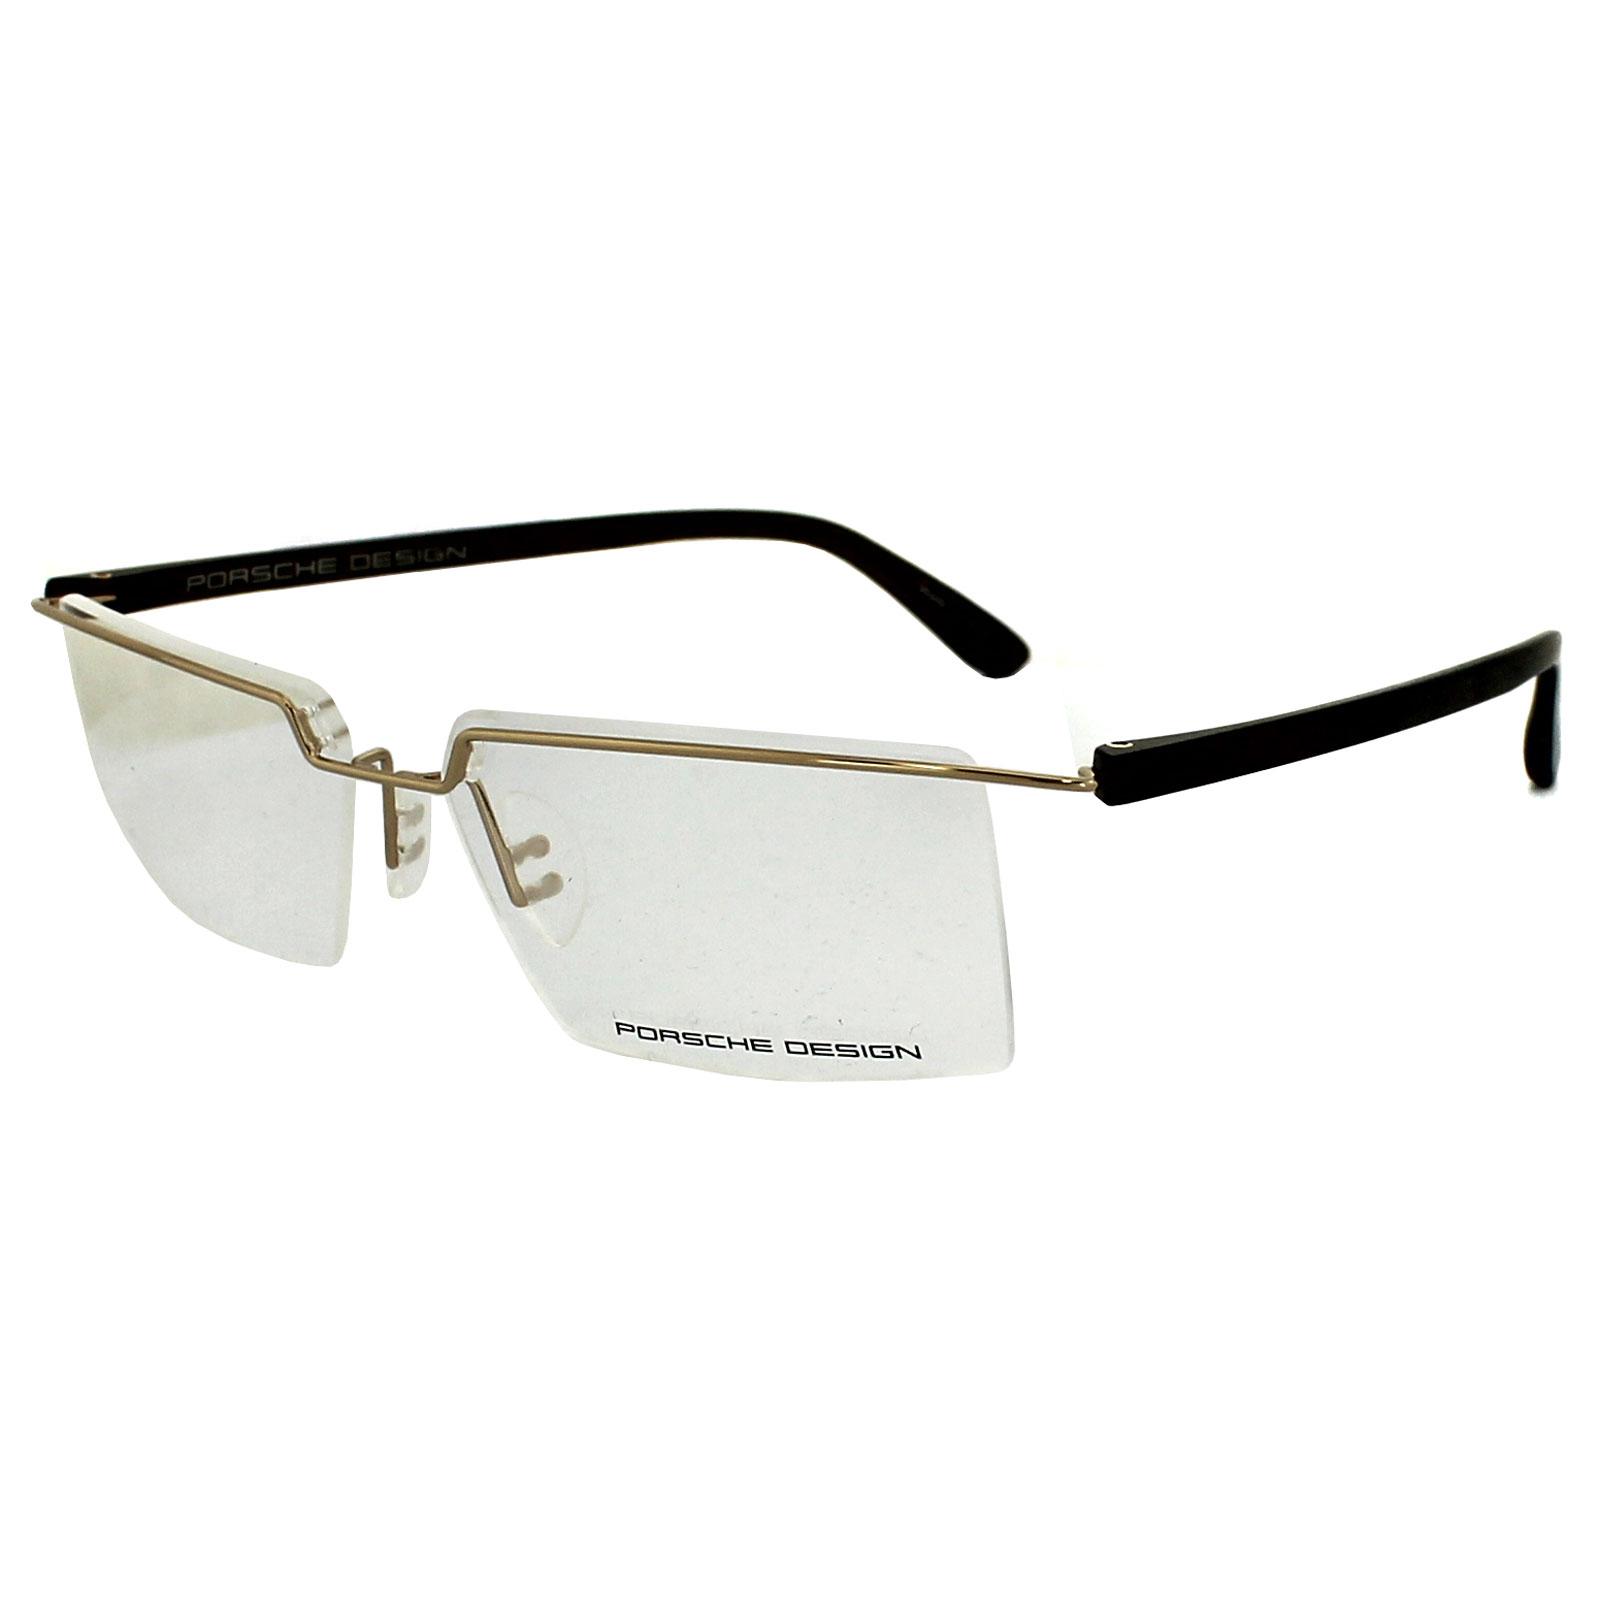 Porsche Design Glasses Frames P8227 B Gold & Dark Brown eBay